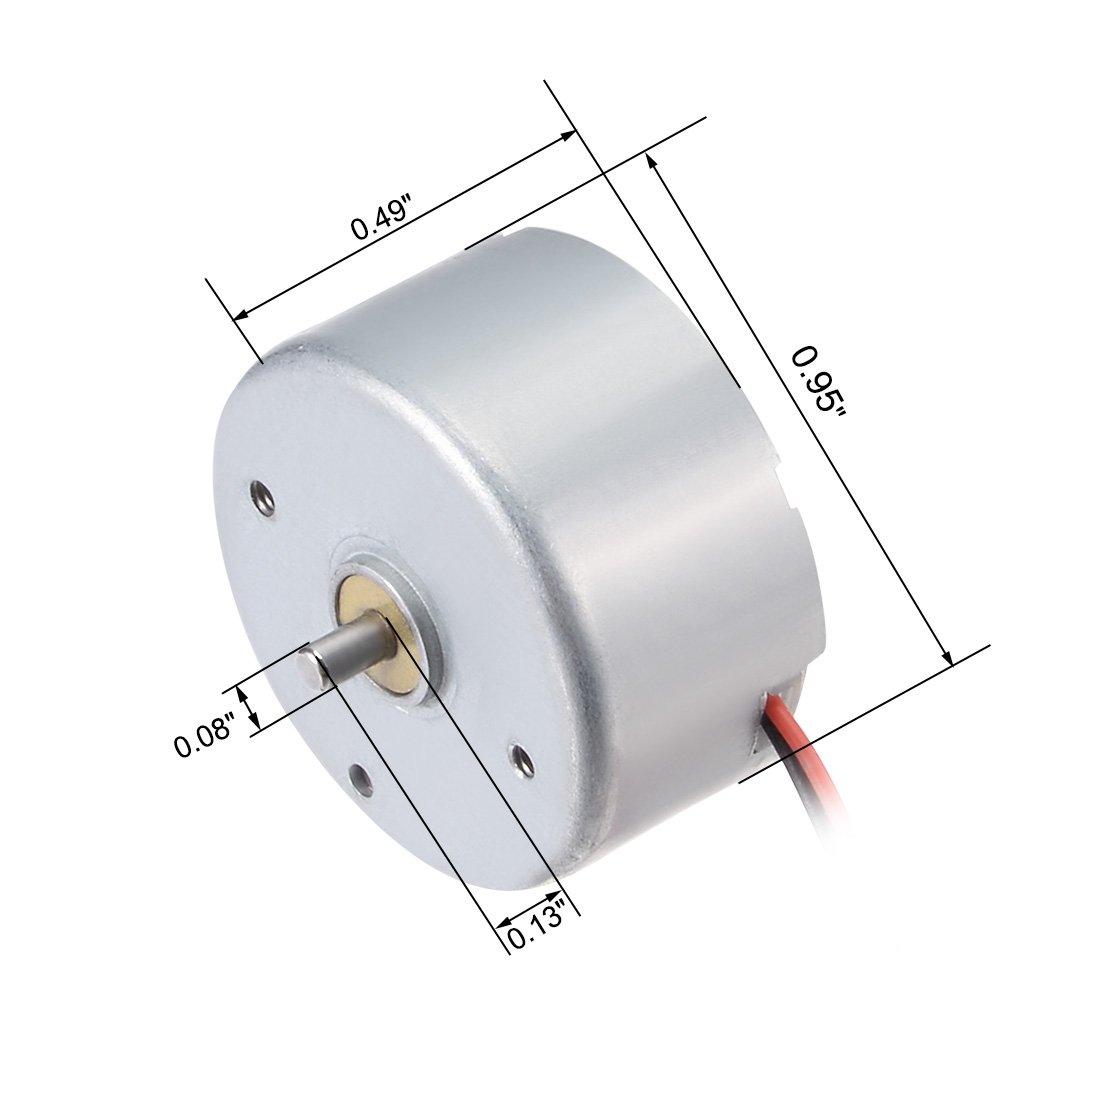 1700-7300RPM 1.5-6.5V High Torque Cylinder Electric Mini DC Motor LW